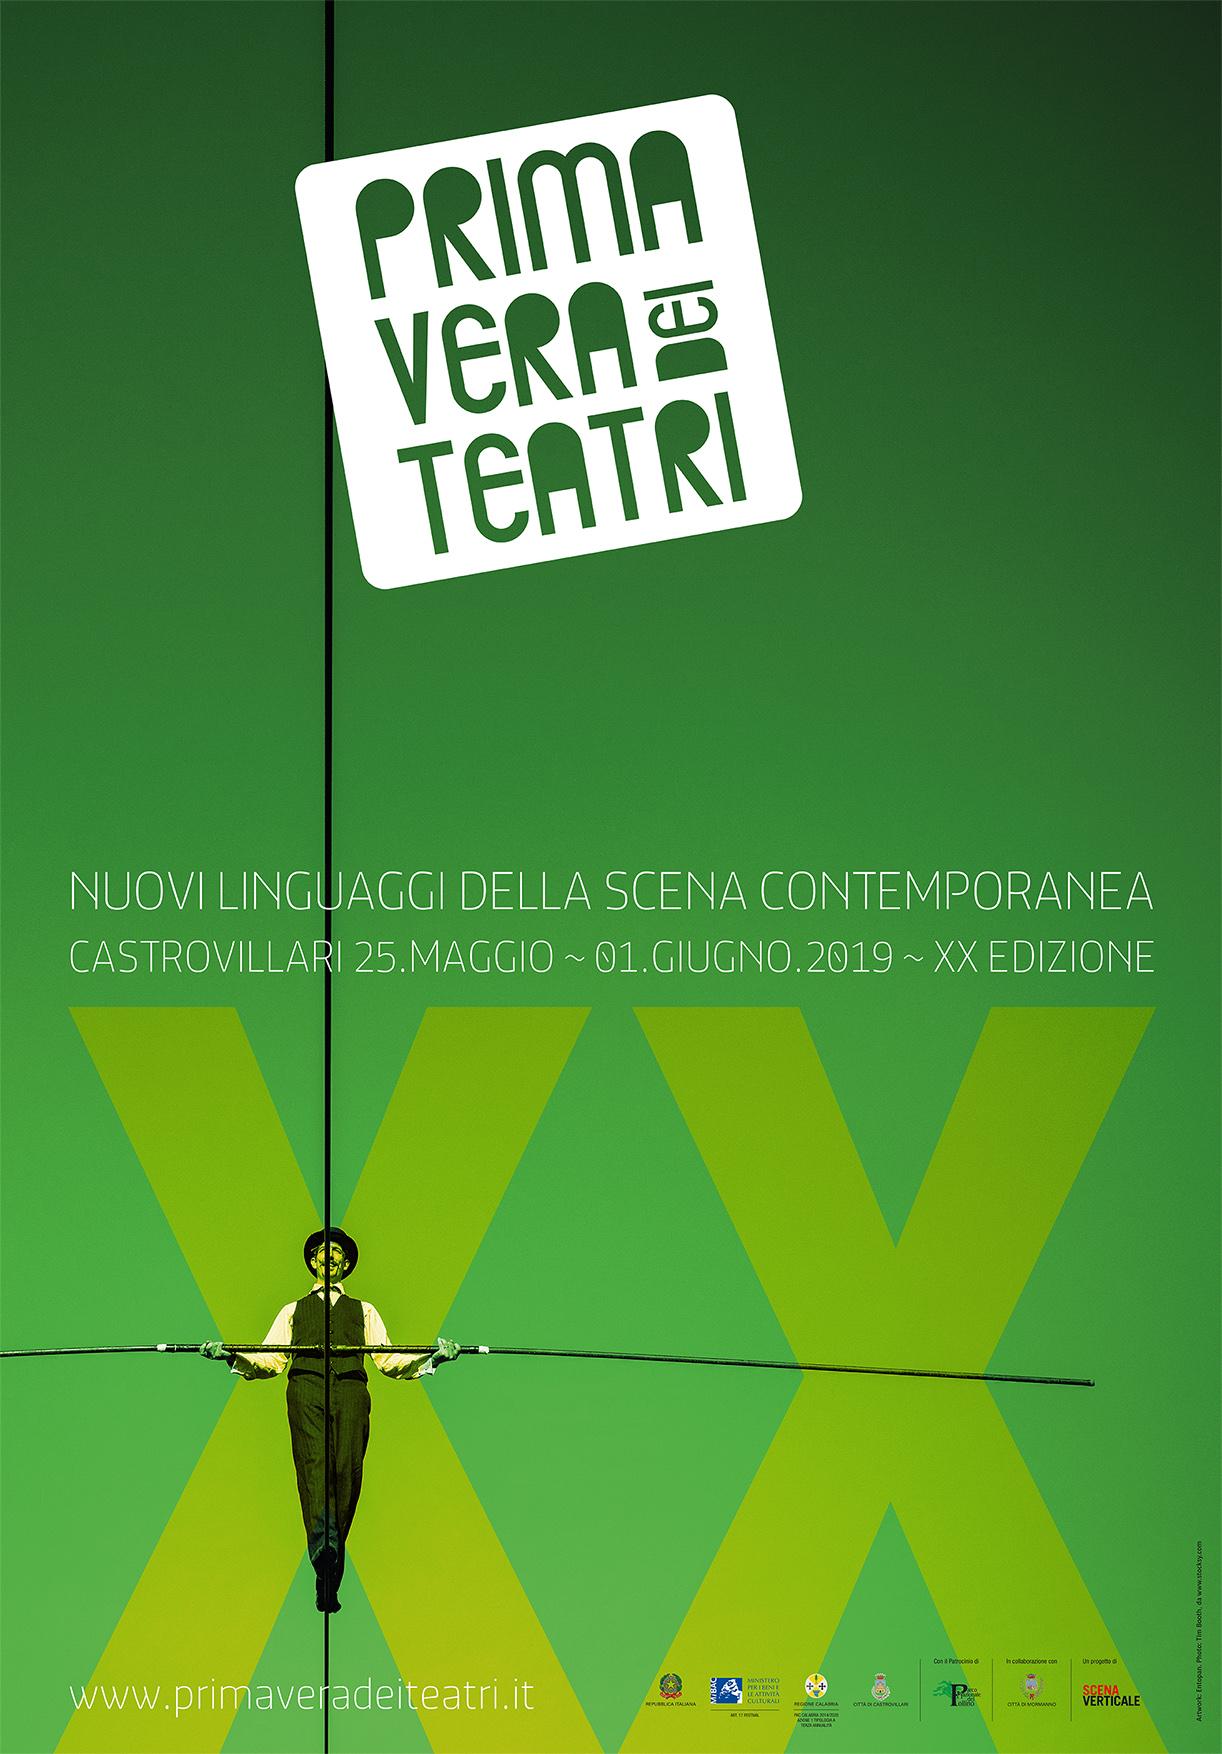 Primavera dei teatri 2019